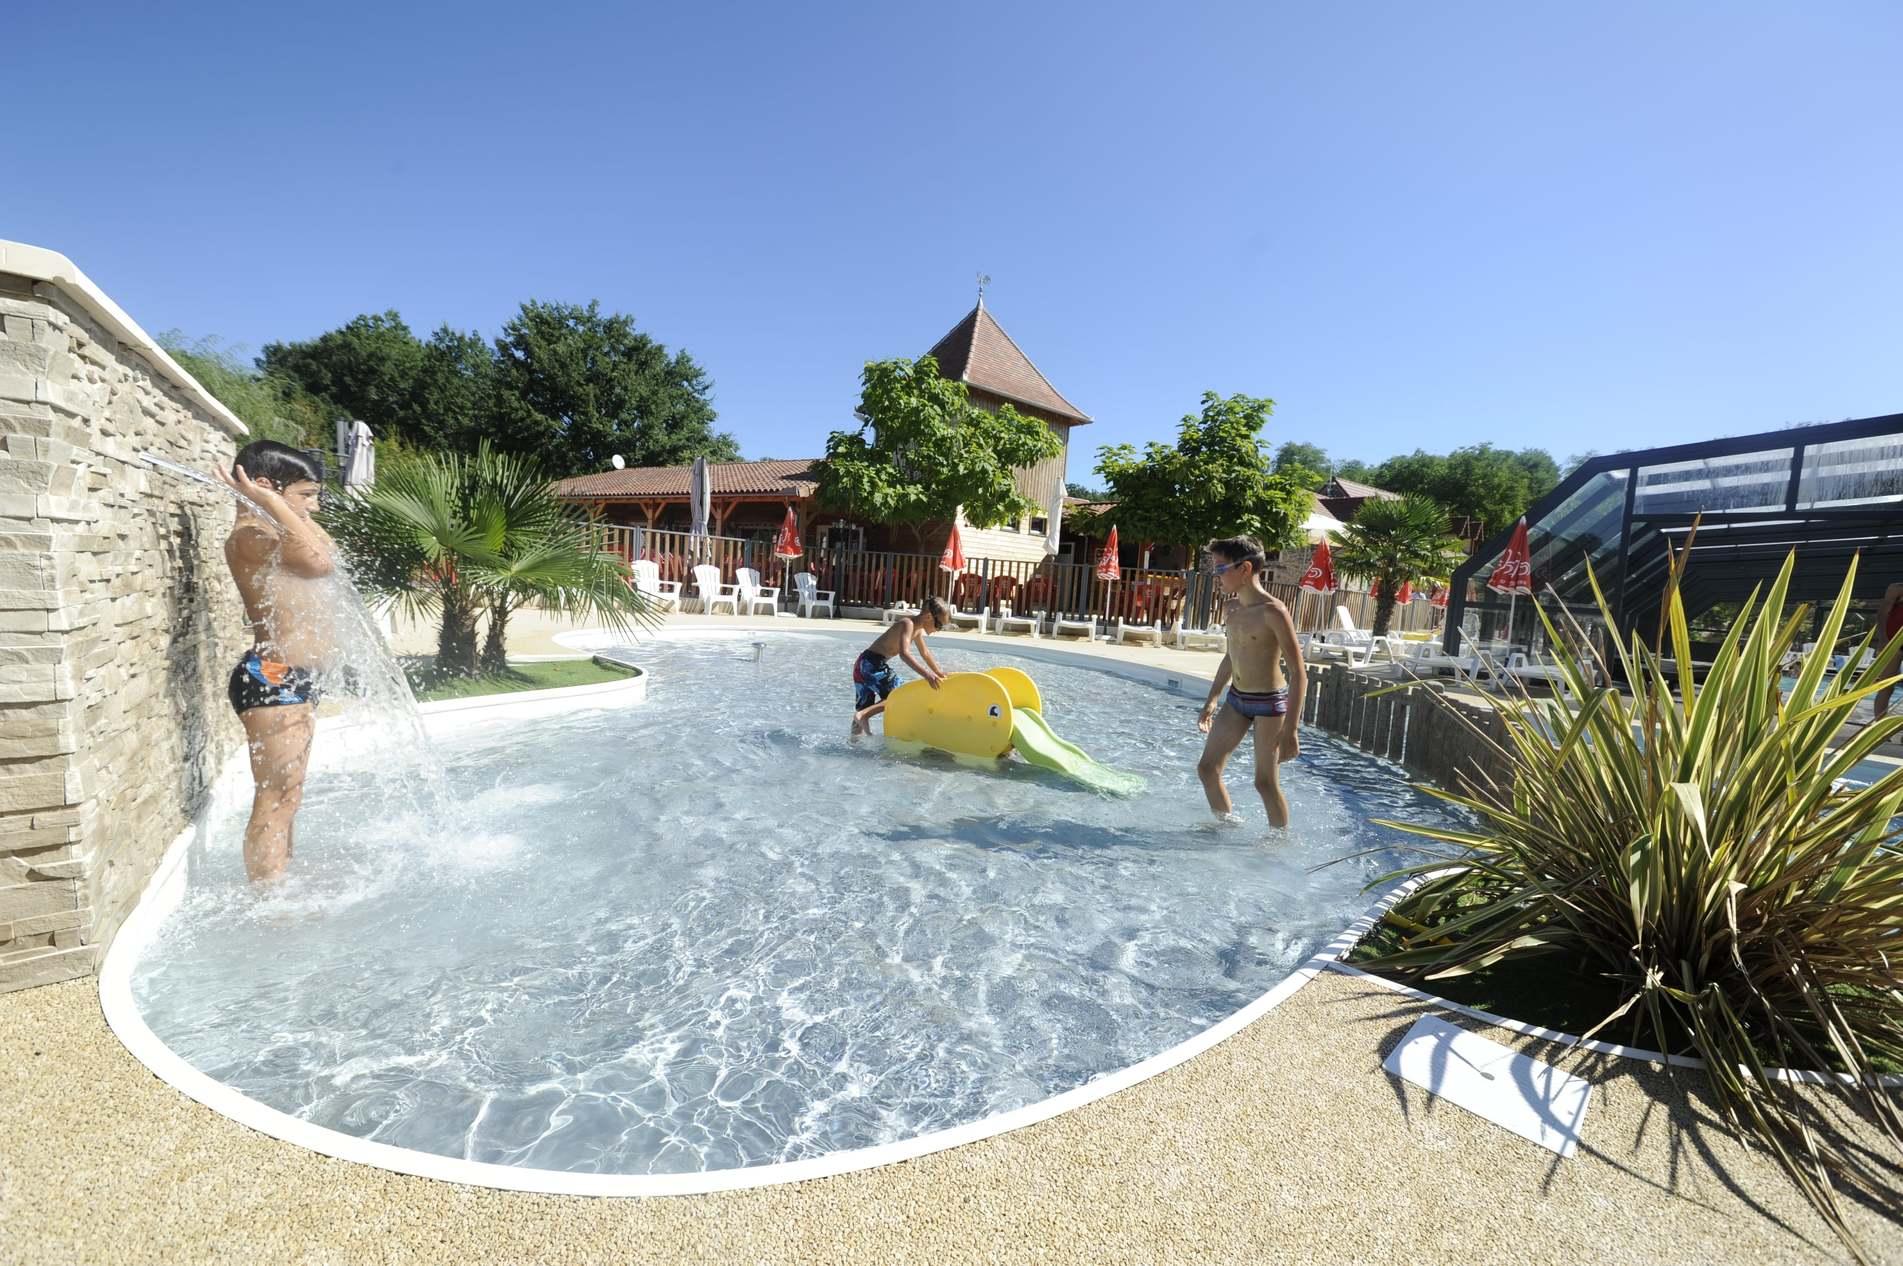 Frankrijk-Rocamadour-Camping%20Padimadour-ExtraLarge Wintersport Frankrijk|Pagina 2 van 55